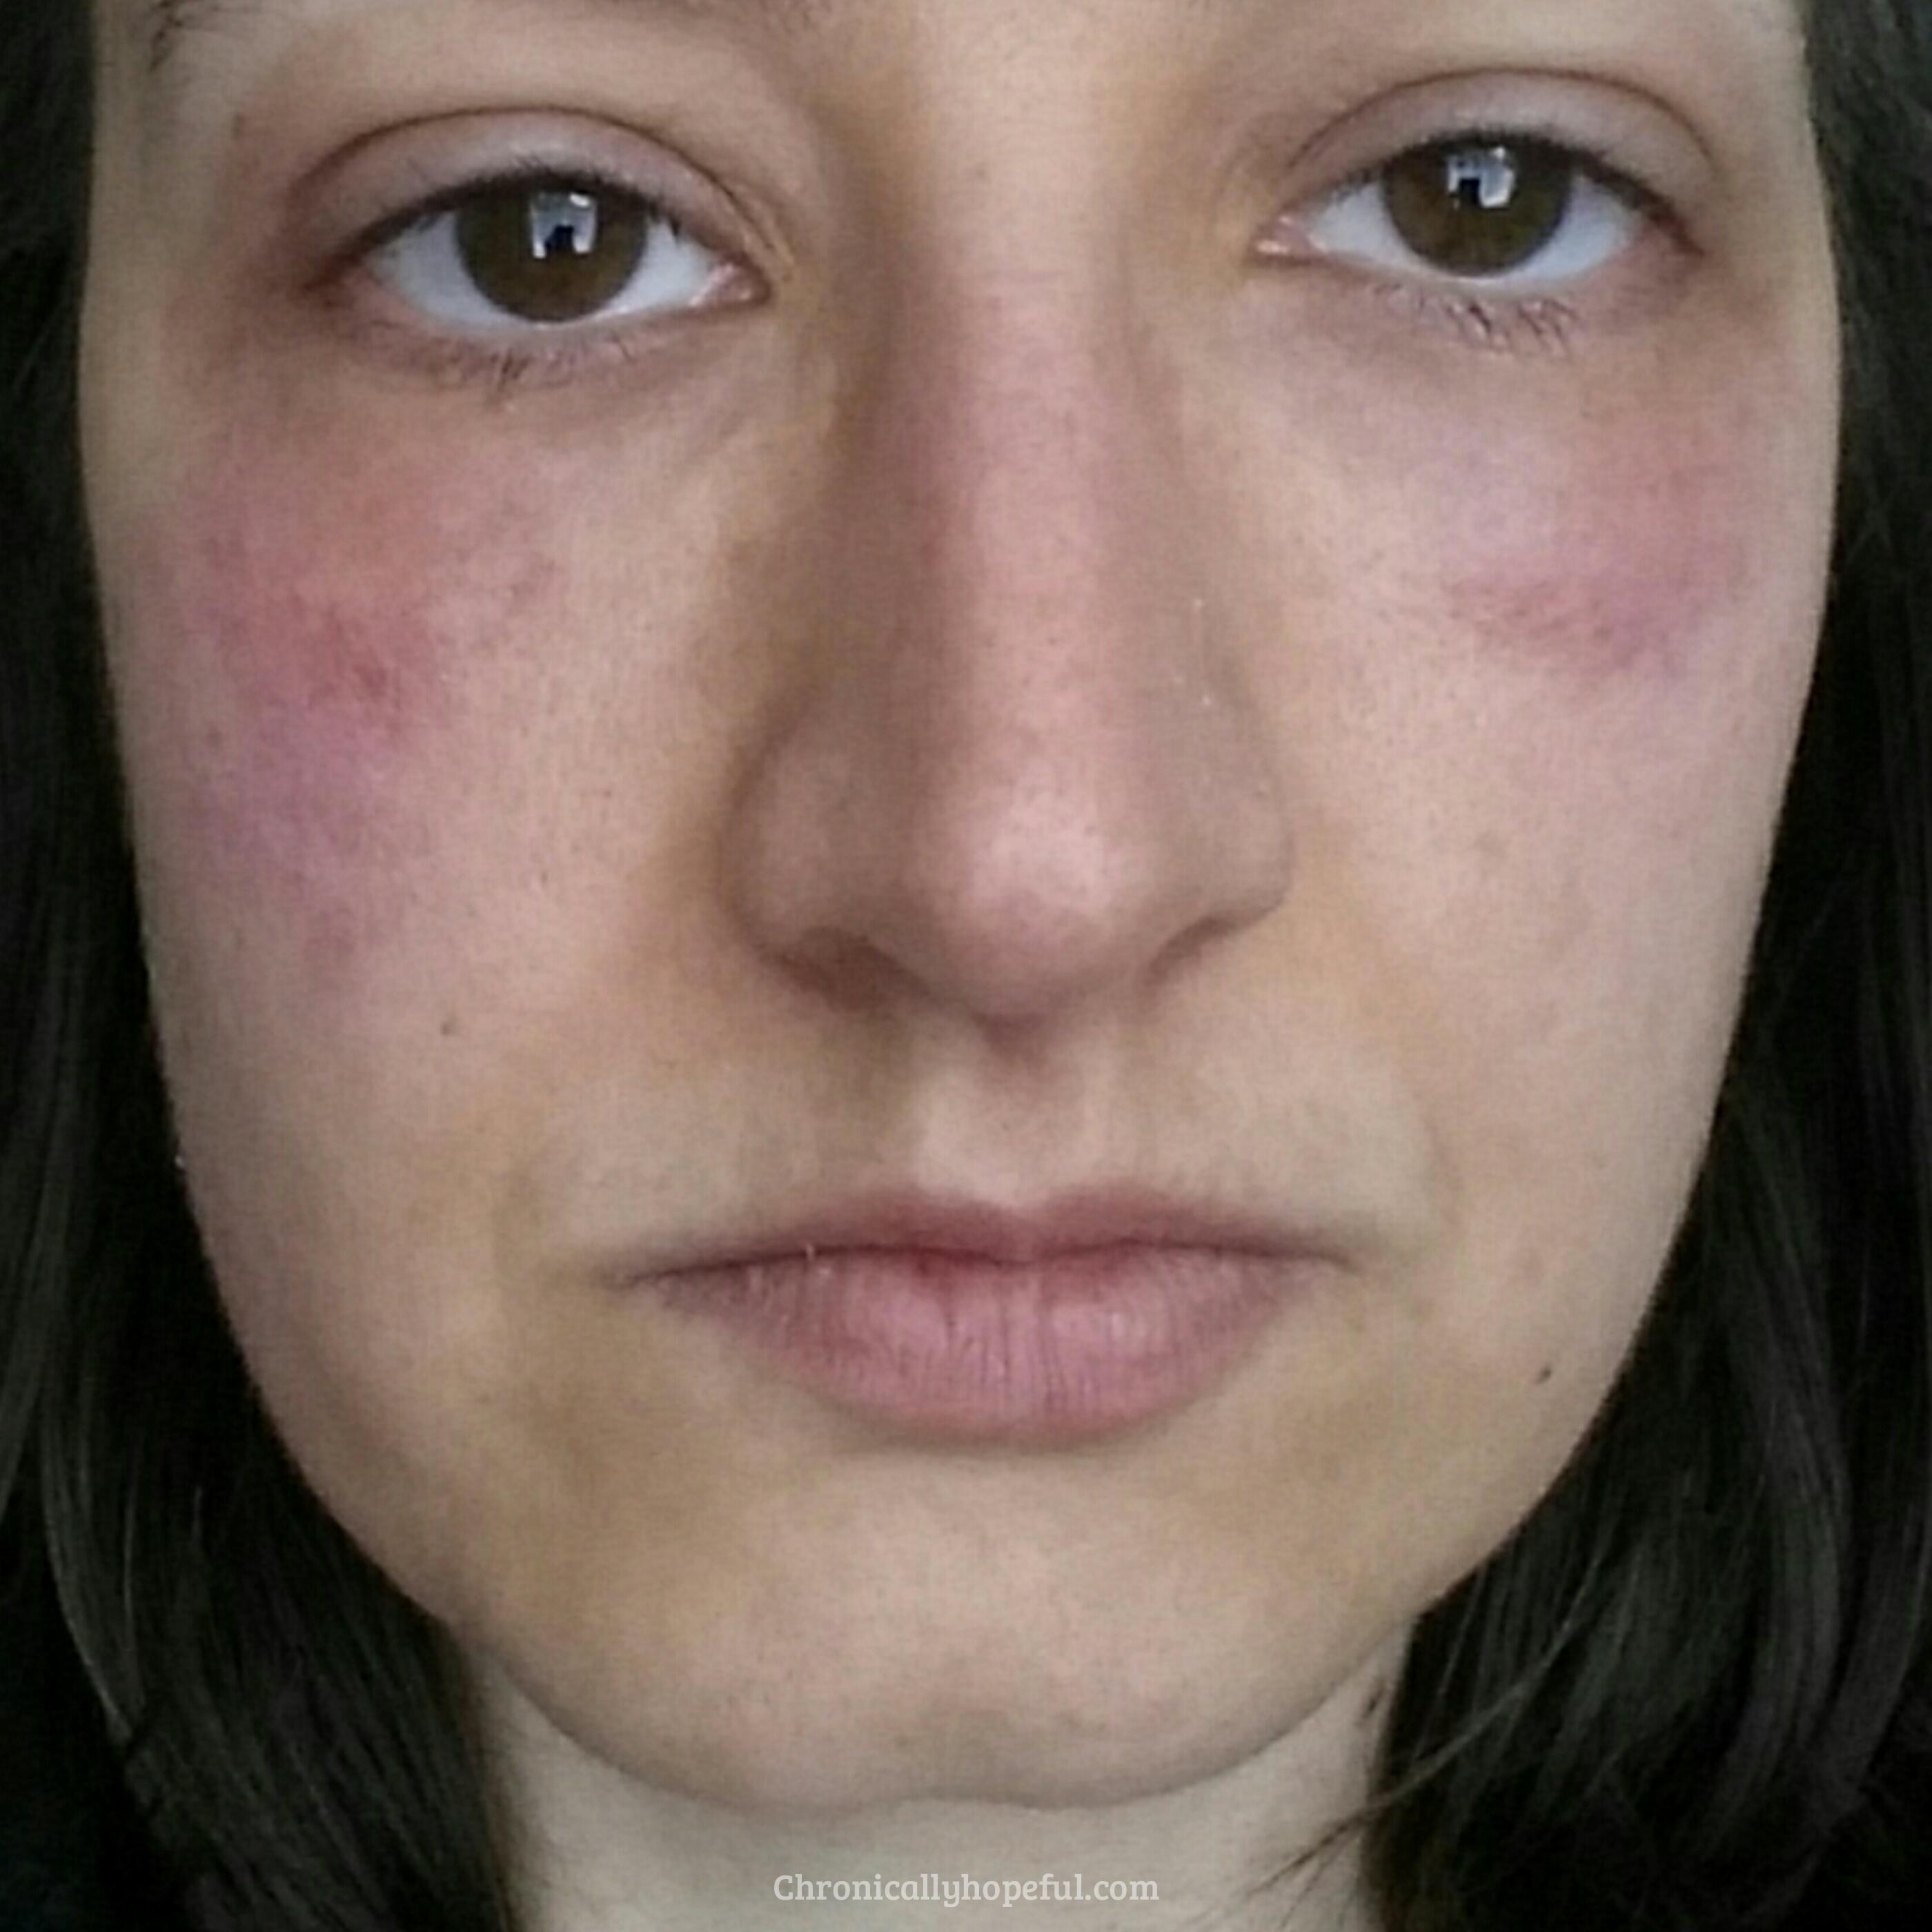 Rash On My Face, Histamine Intolerance, Chronically Hopeful